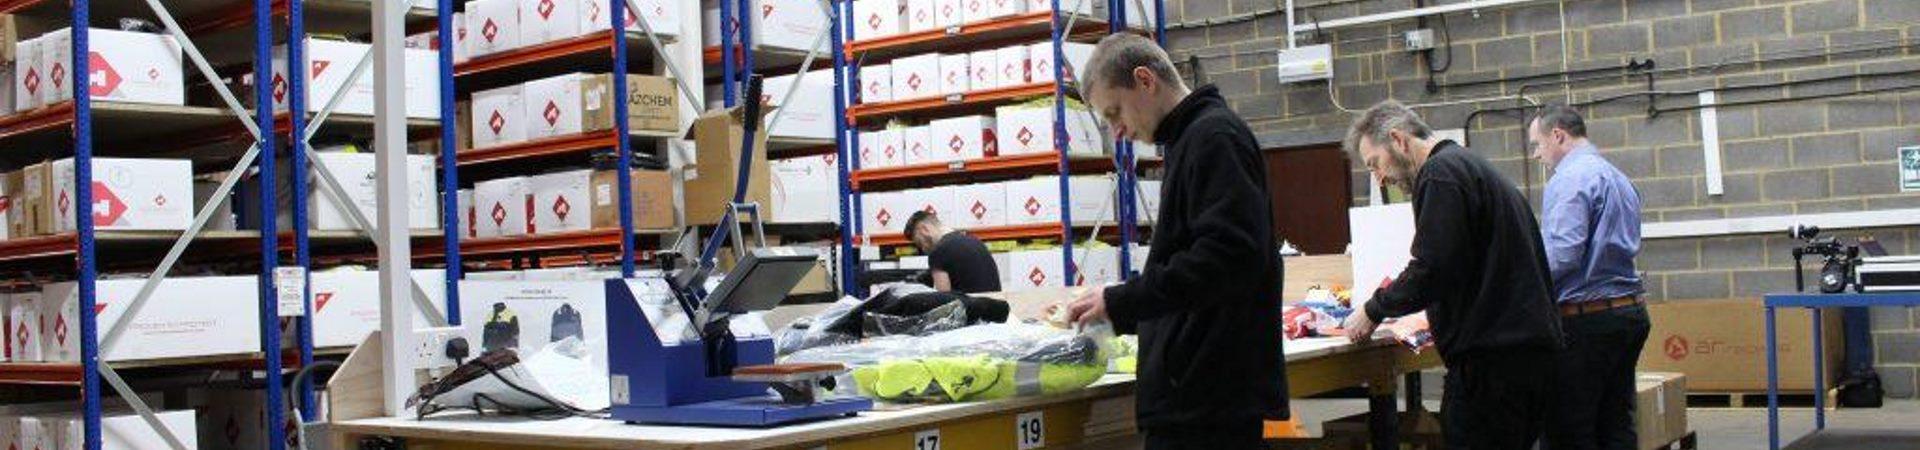 Hazchem Warehouse Heads Down New Racking